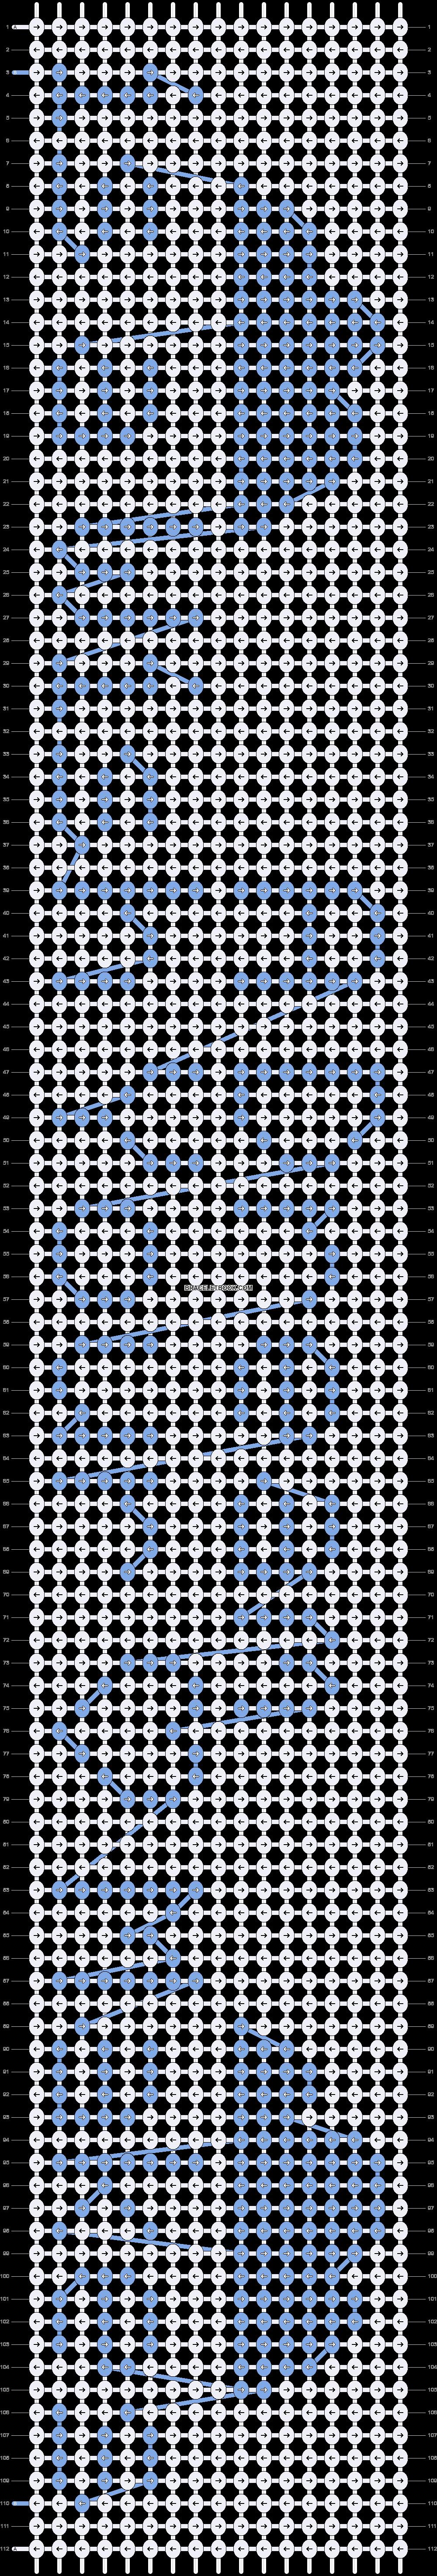 Alpha pattern #12162 pattern